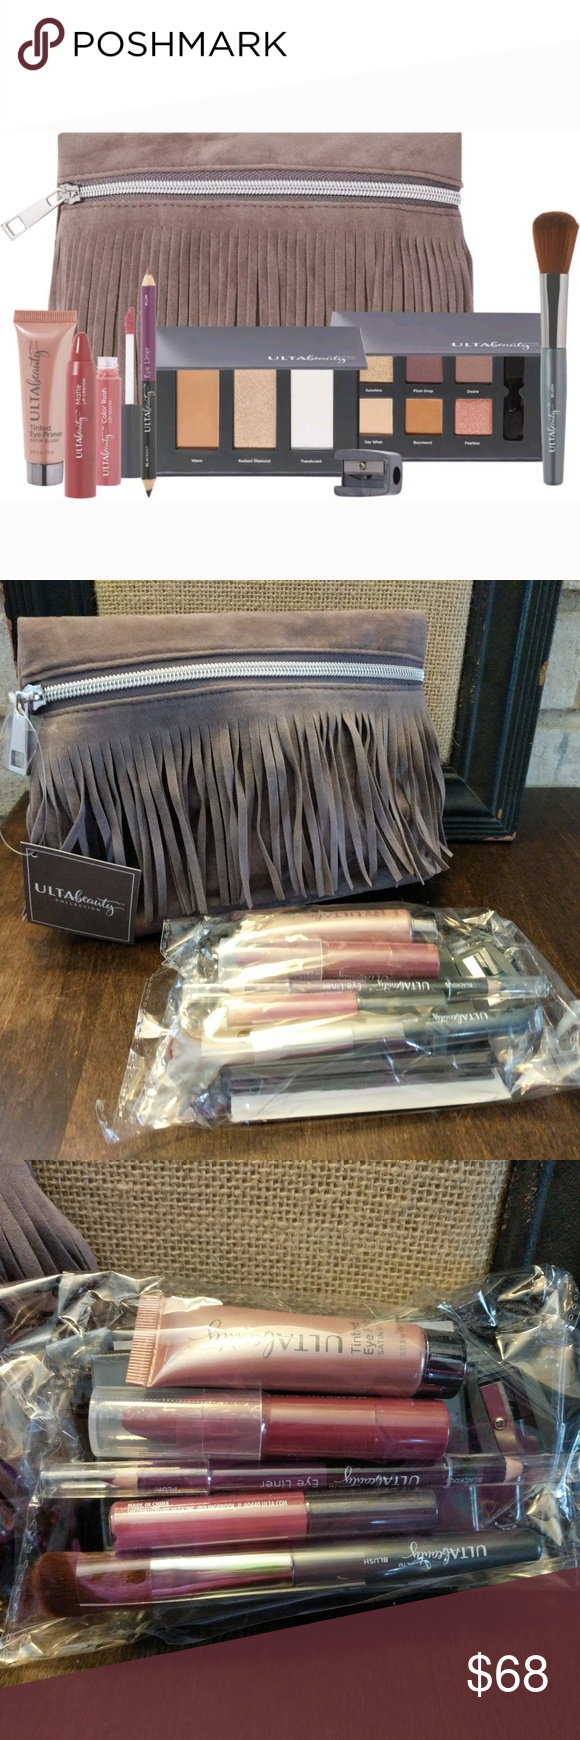 NEW Ulta Fringe Makeup Bag Gift Set Palette Gloss This is